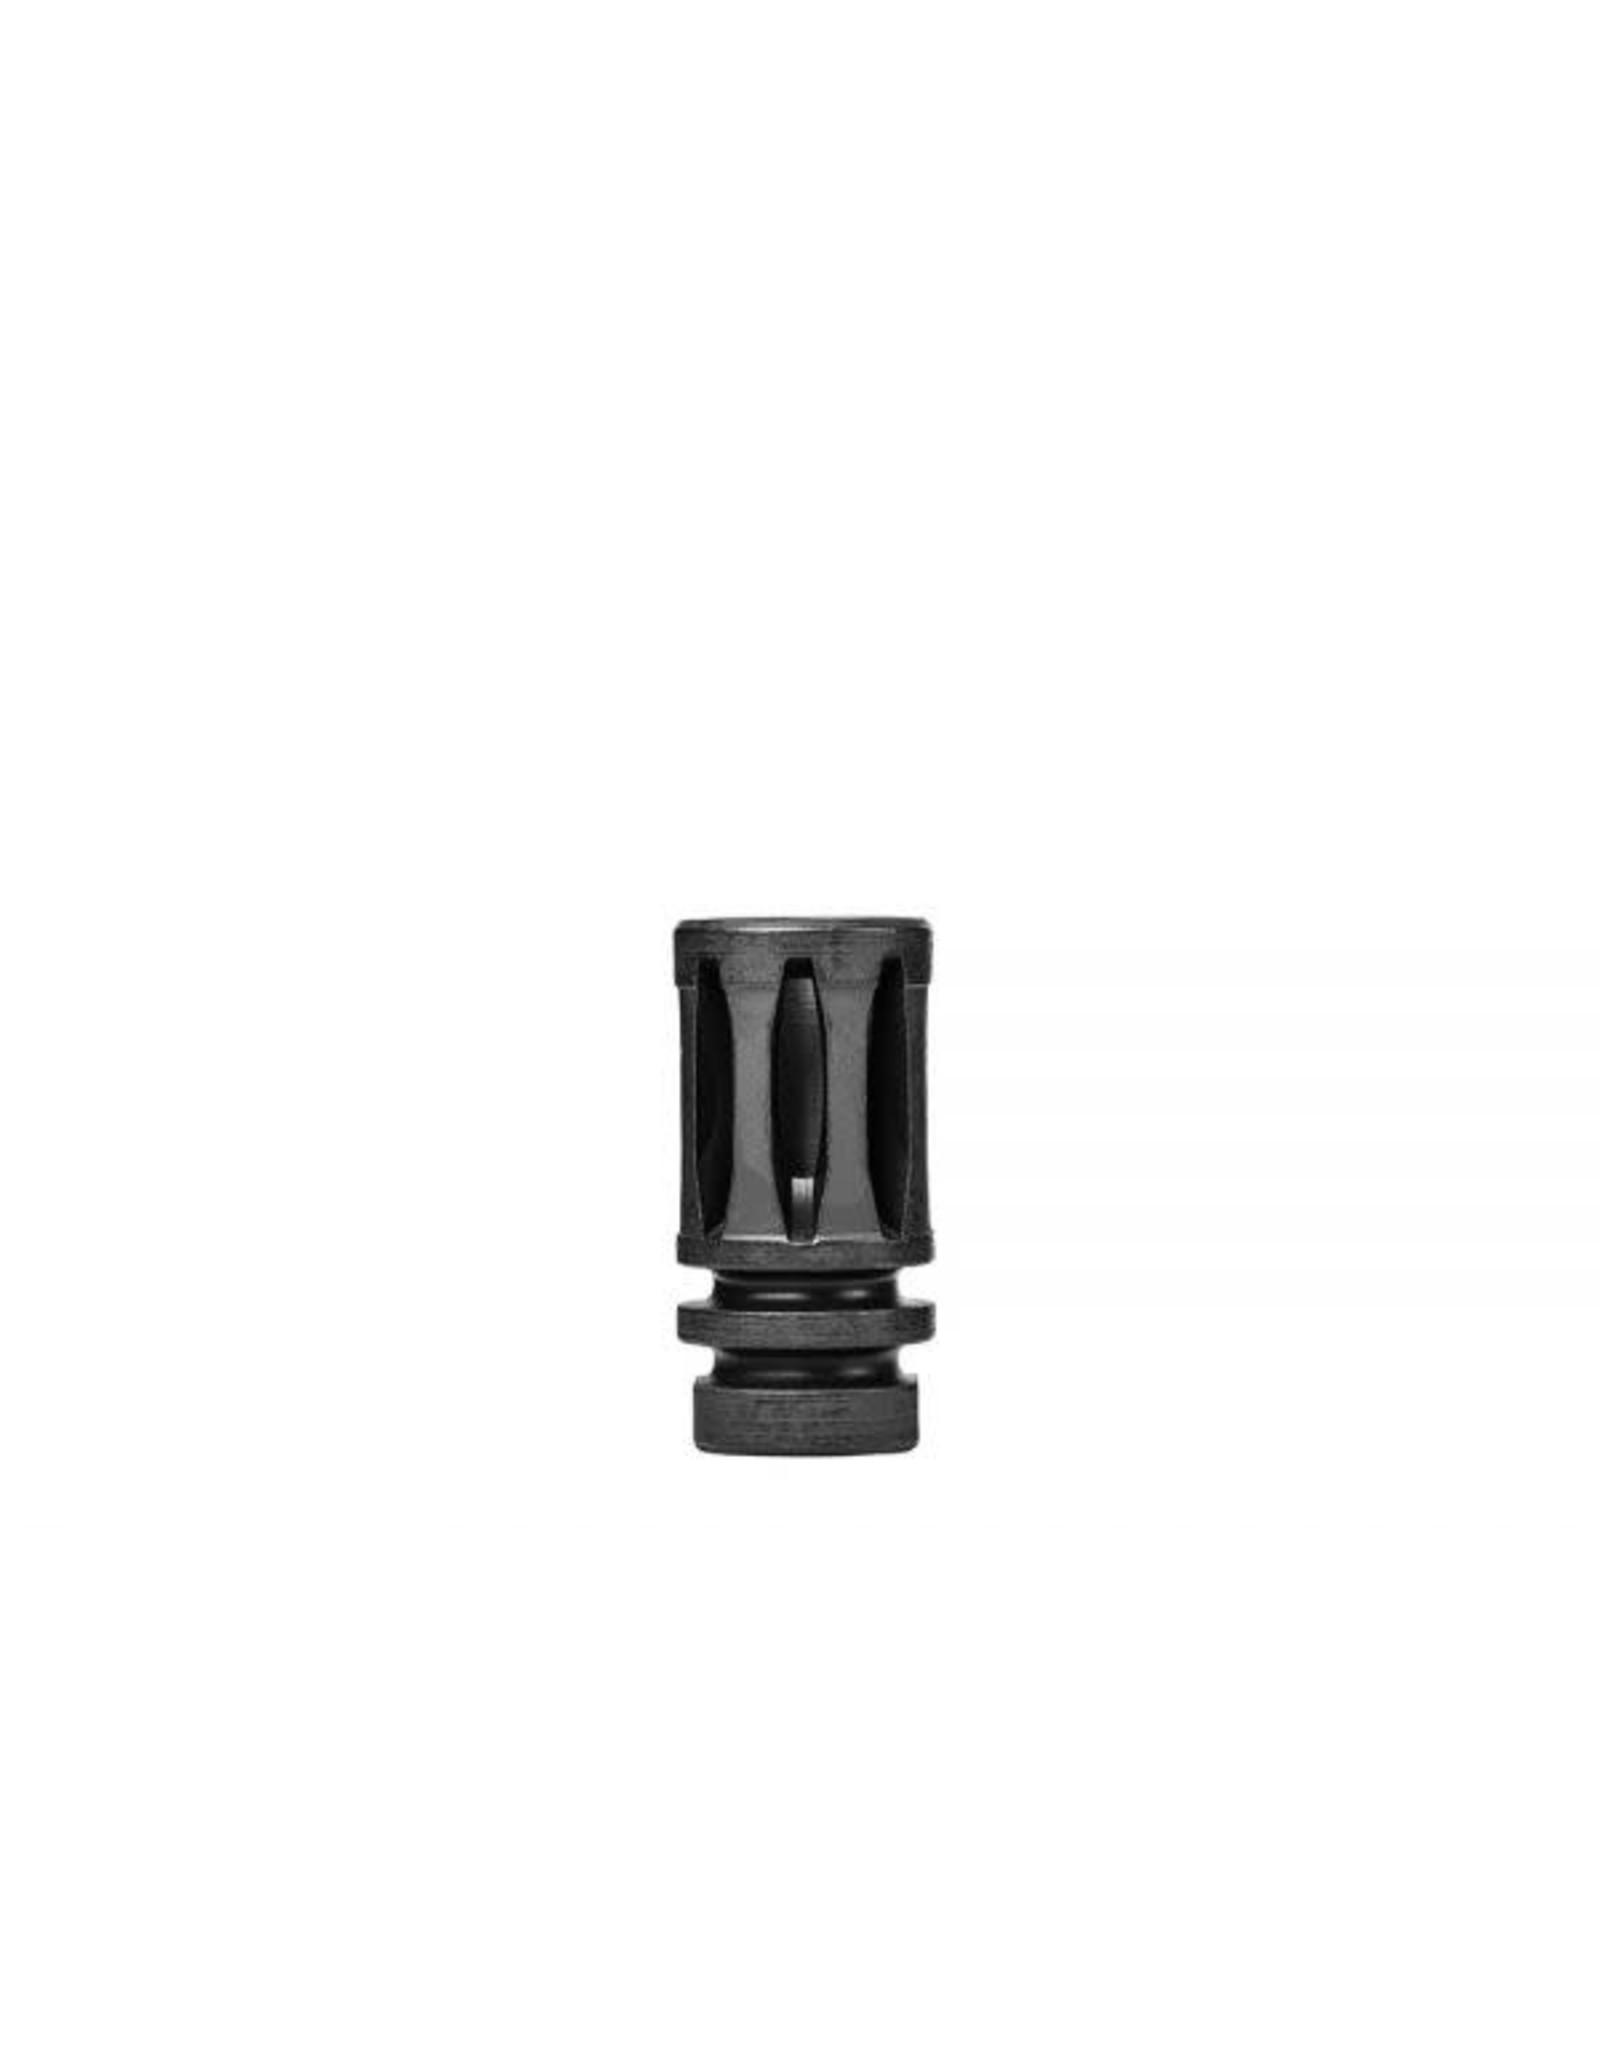 AR15 A2 Birdcage Flash Hider 1/2x28